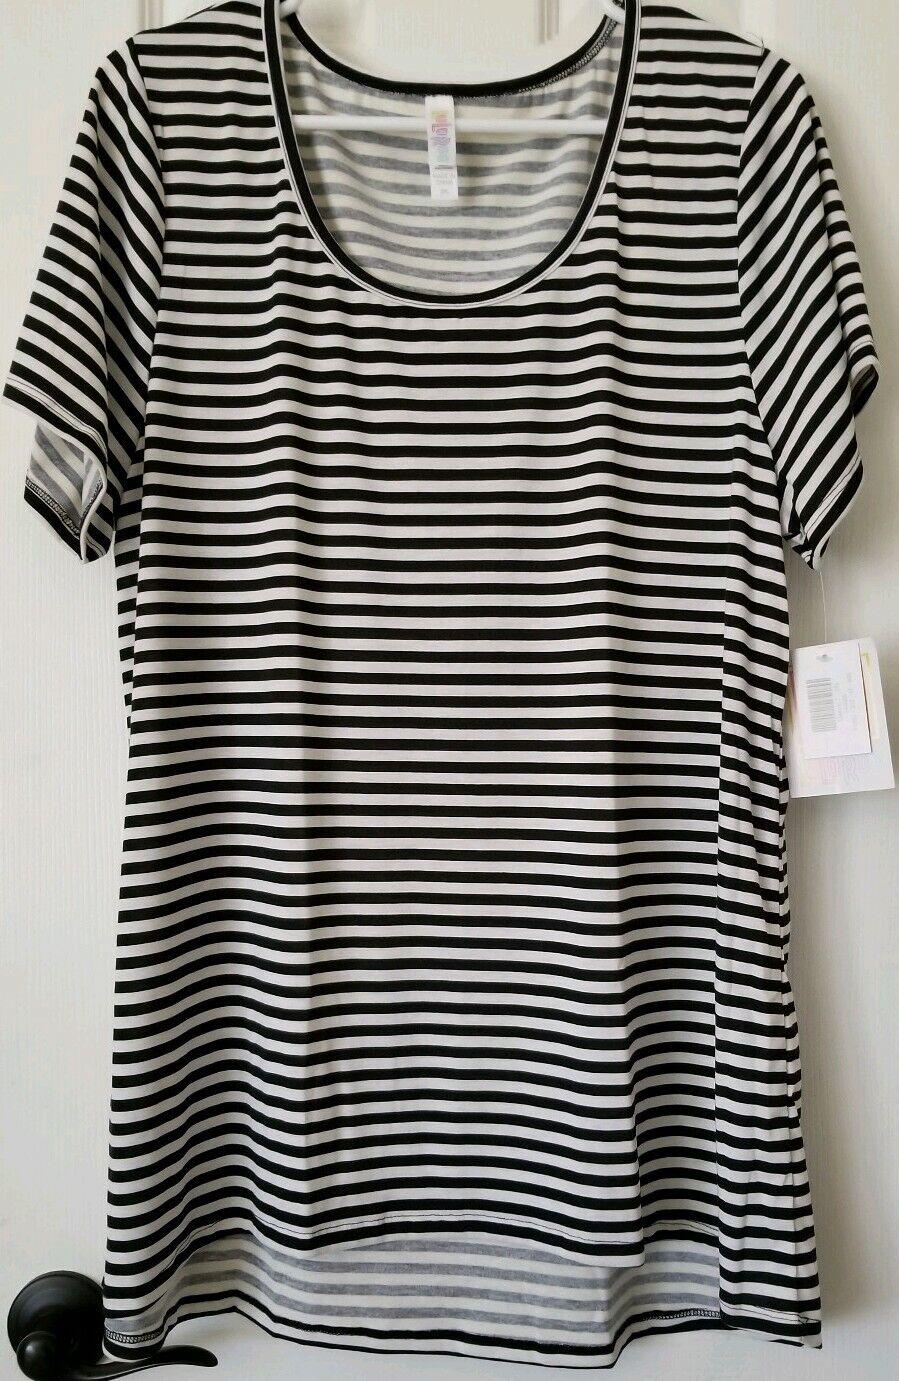 Lularoe schwarz & Weiß Stripes 2XL Classic T Striped Shirt 2X Hard to Find  NEW